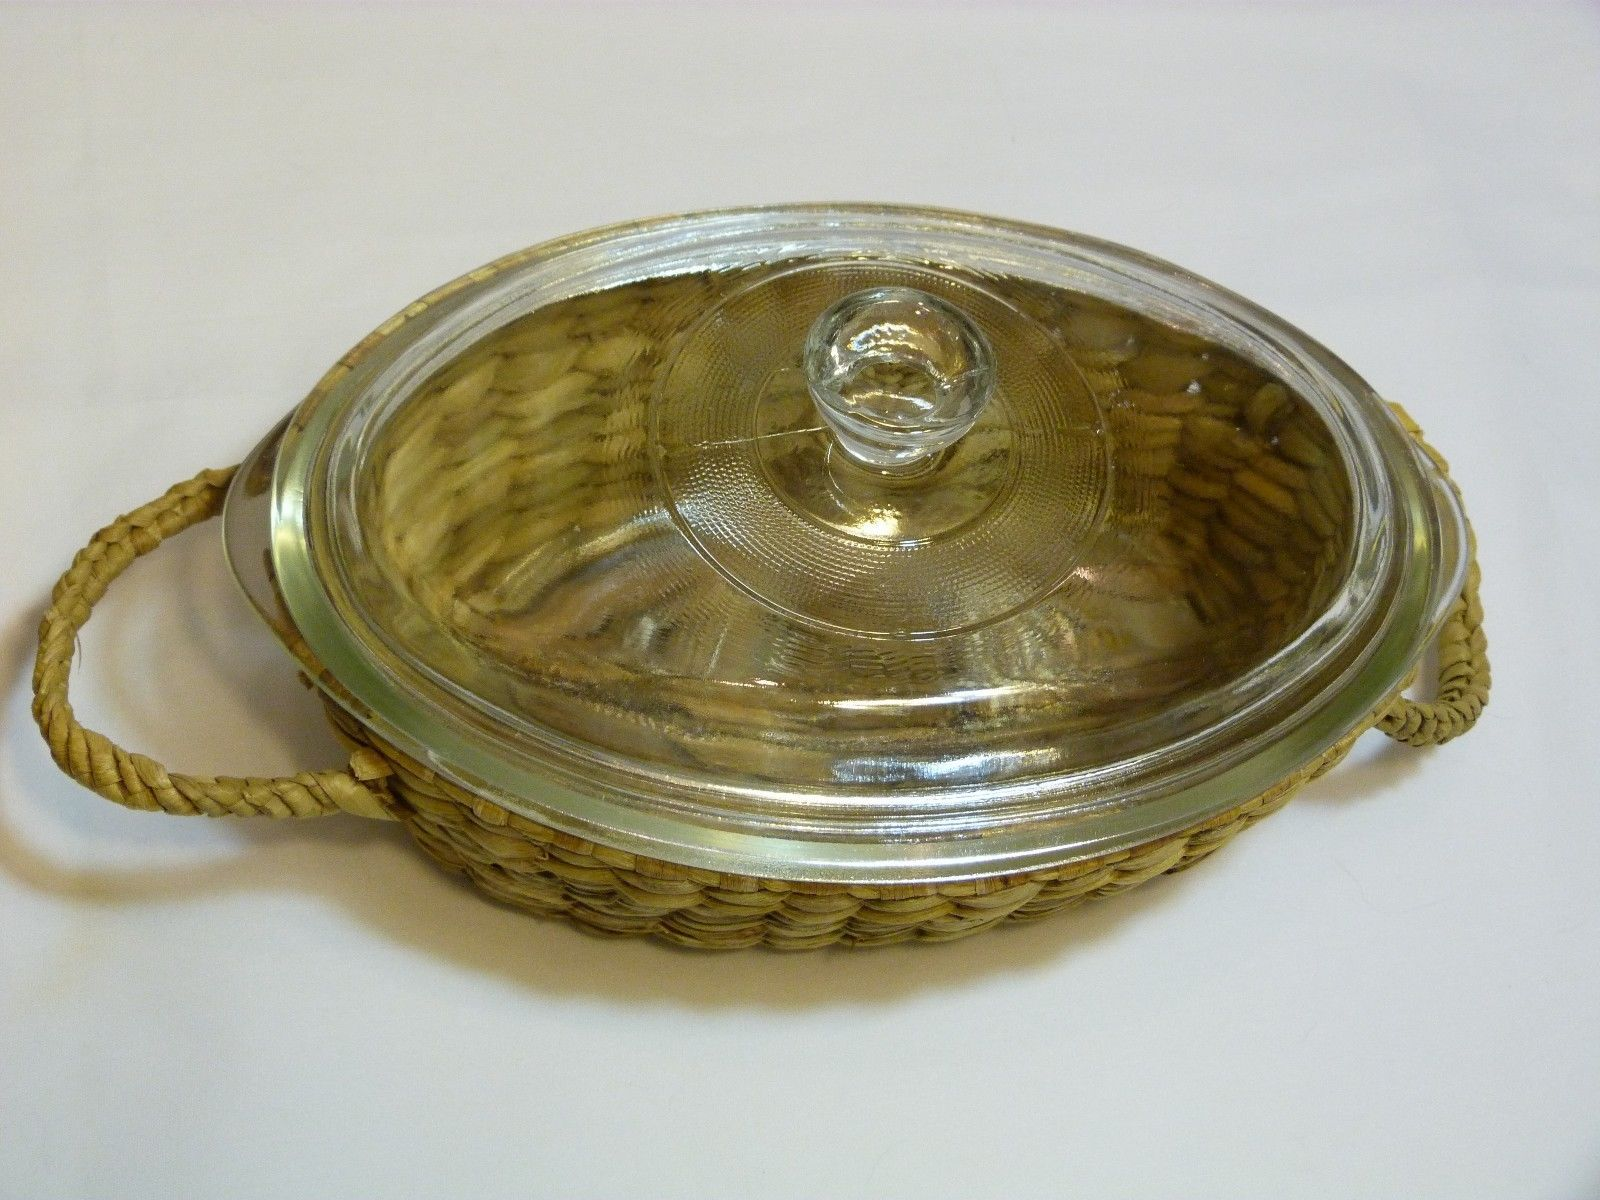 Jeanette Glasbake Clear Glass Oval 1 QT Casserole J235 in Basket New Old Stock